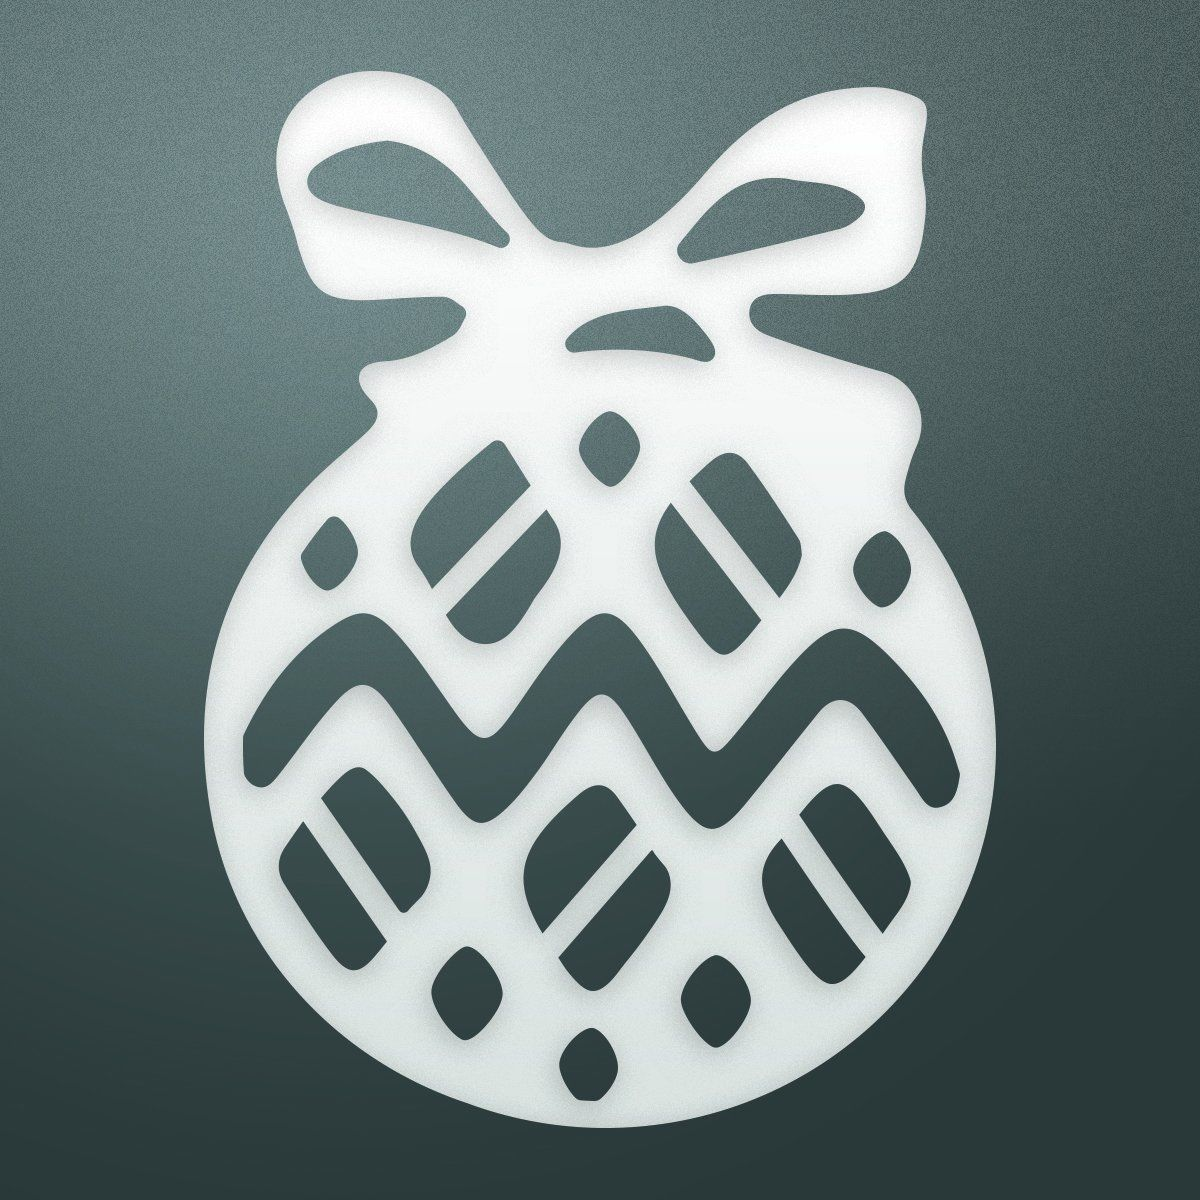 Couture Creations bombka mini matryca, metal, czarny, 12,2 x 6,6 x 0,2 cm